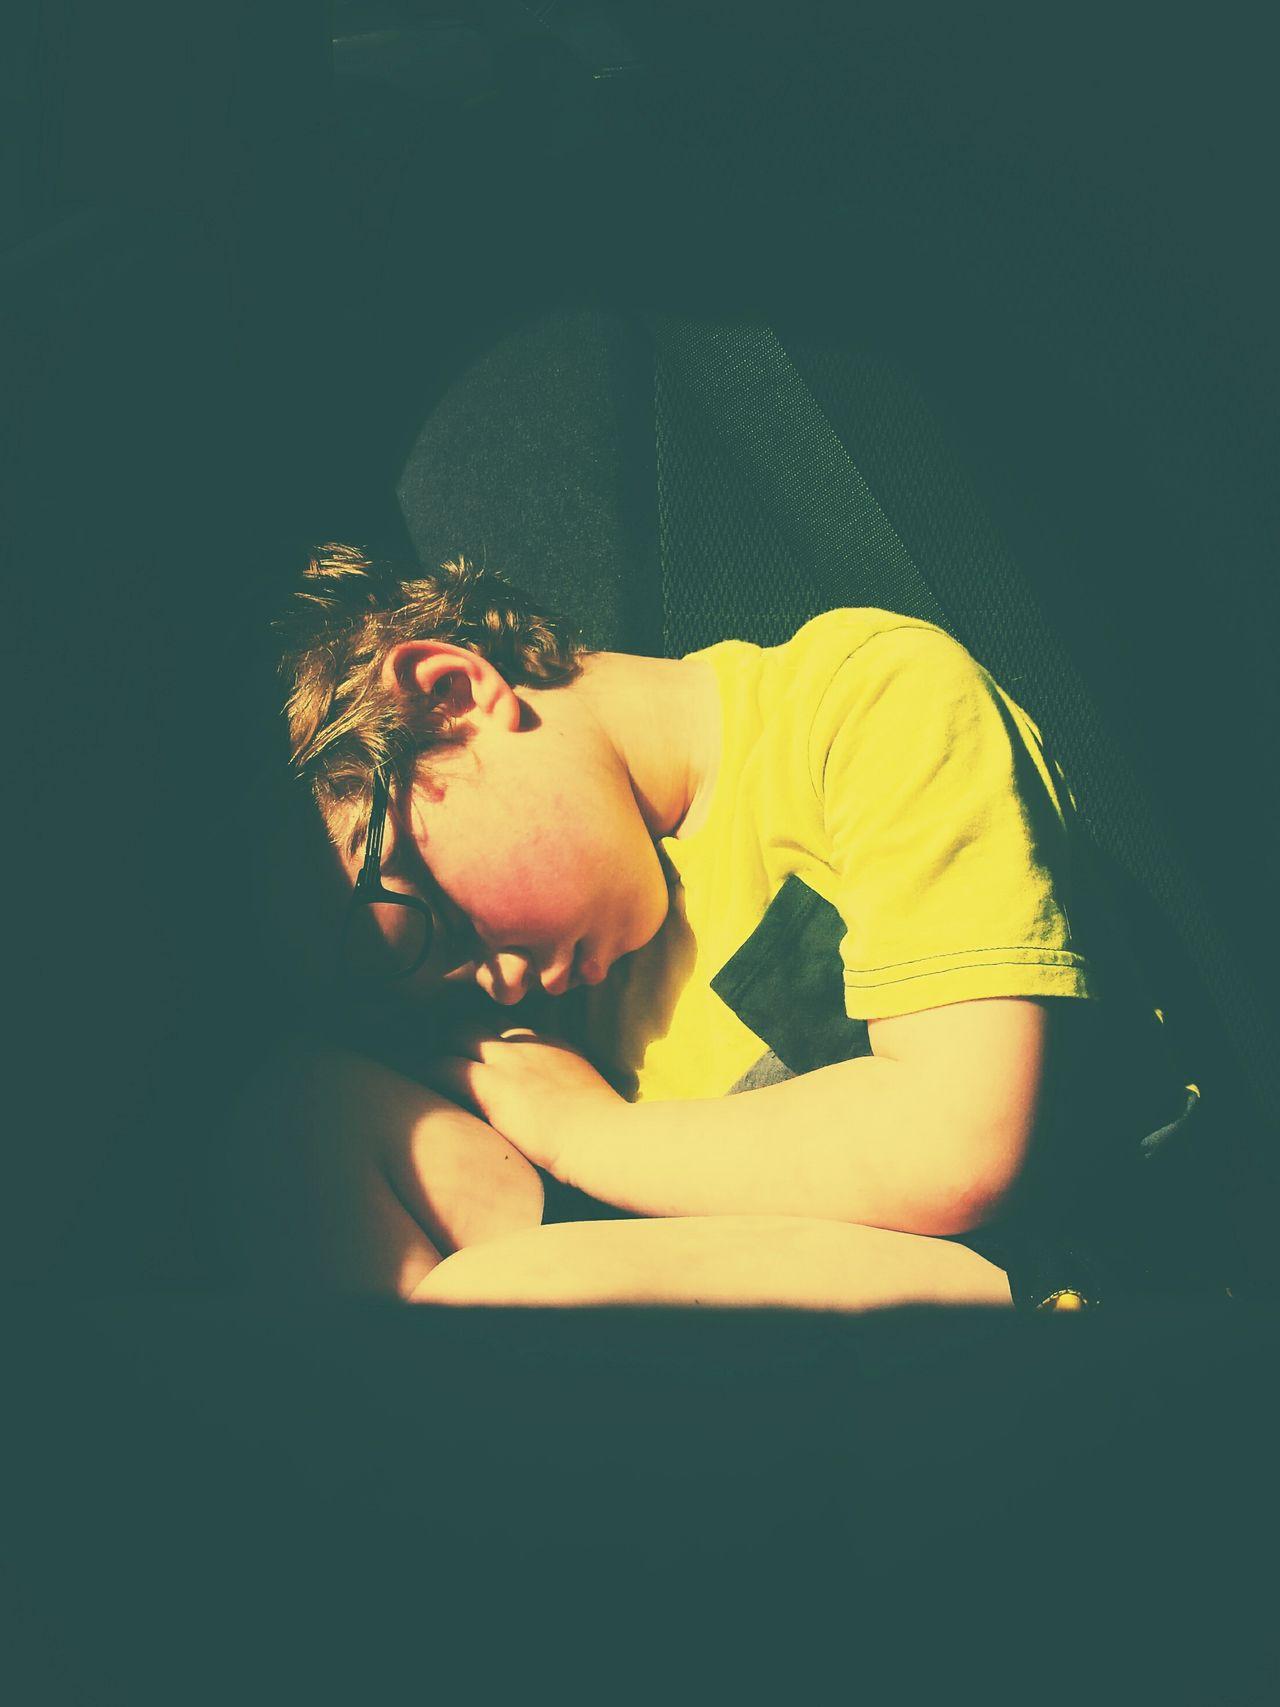 my sleepy boy! Happymothersday Beautiful Day Sleepy CarRides Roadtrip